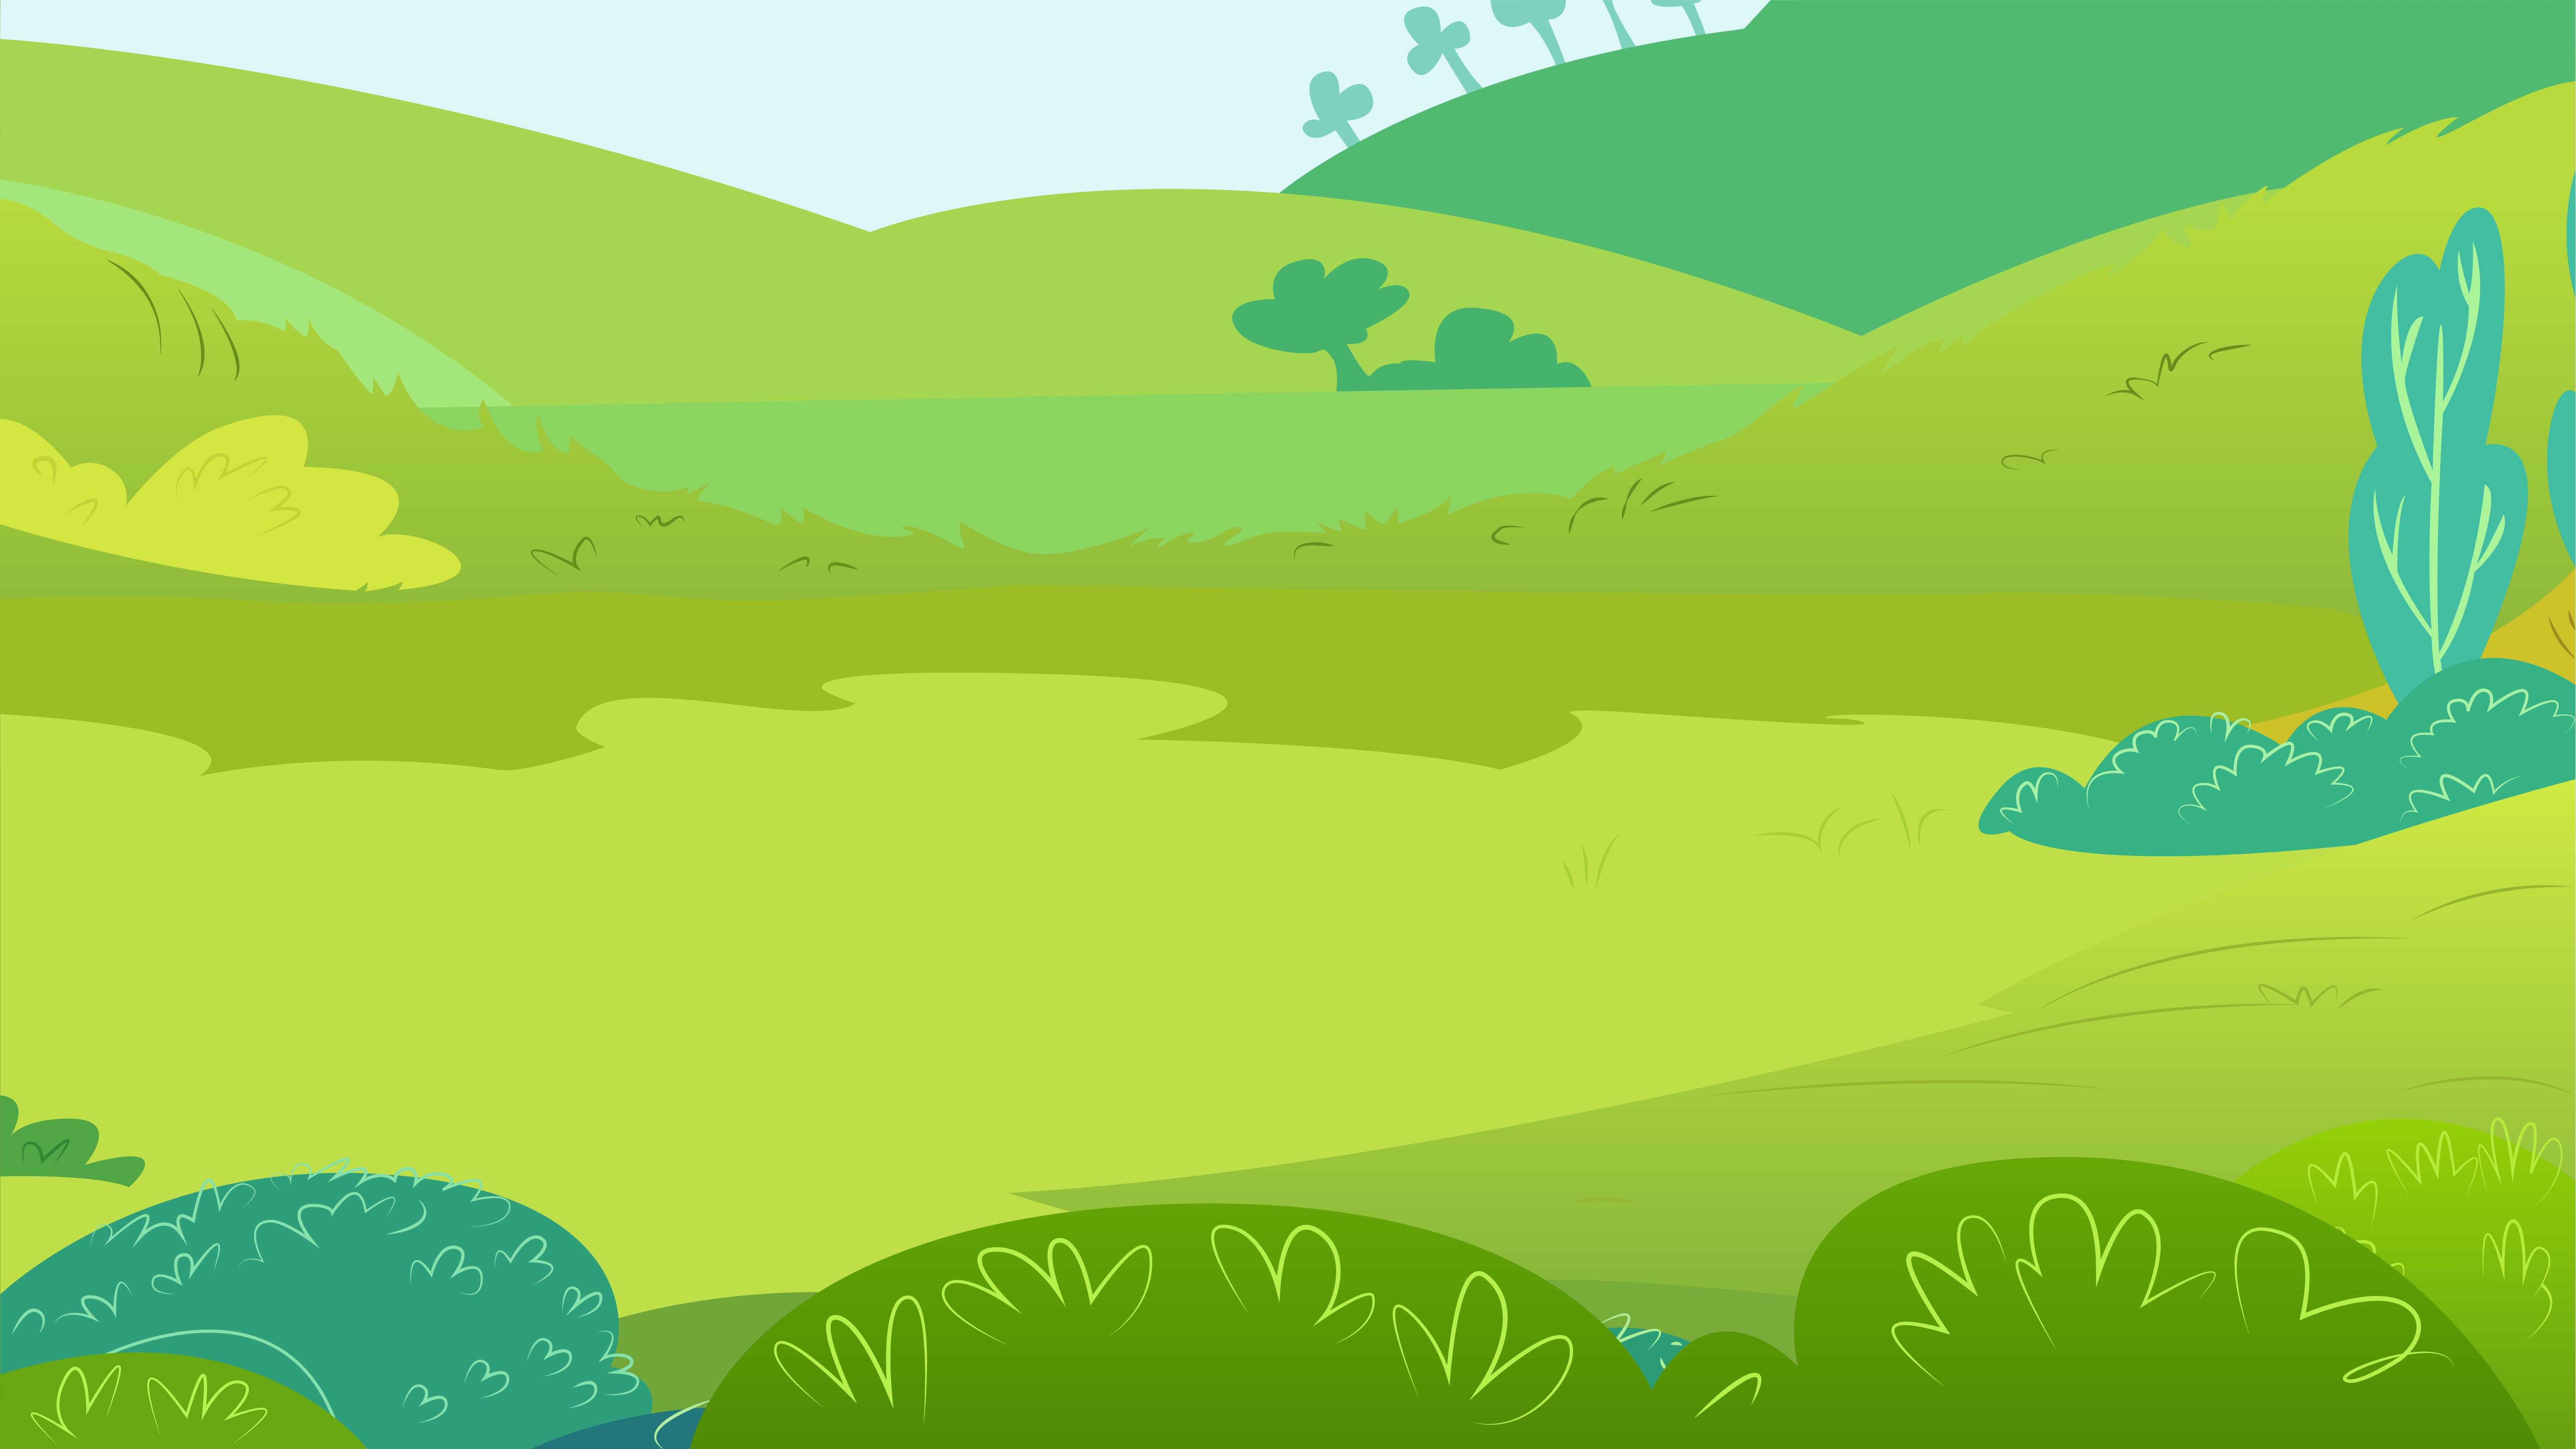 Green Valley by Silentmatten